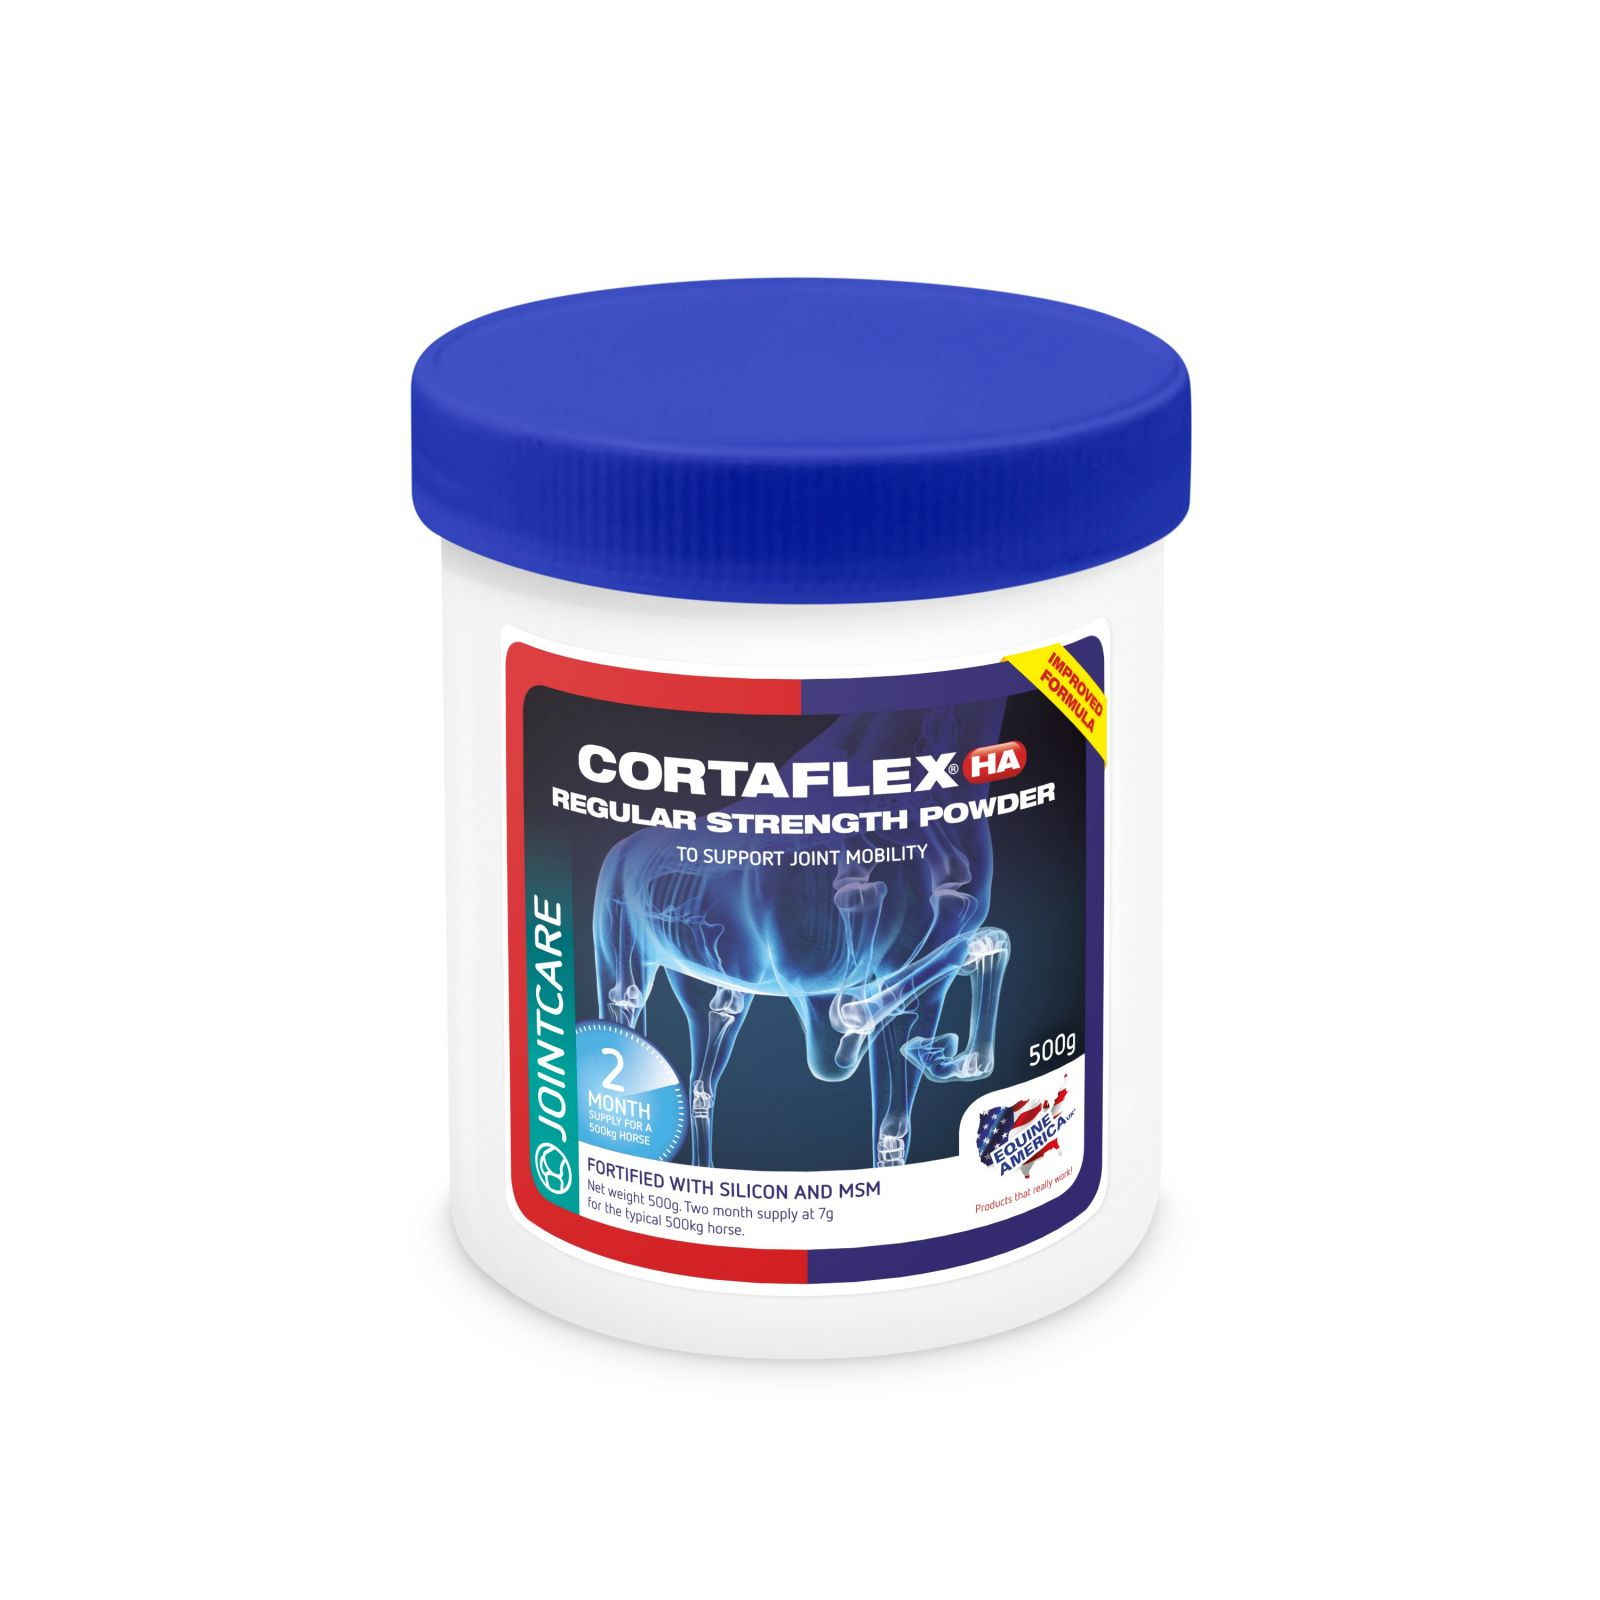 CORTAFLEX® HA REGULAR POWDER